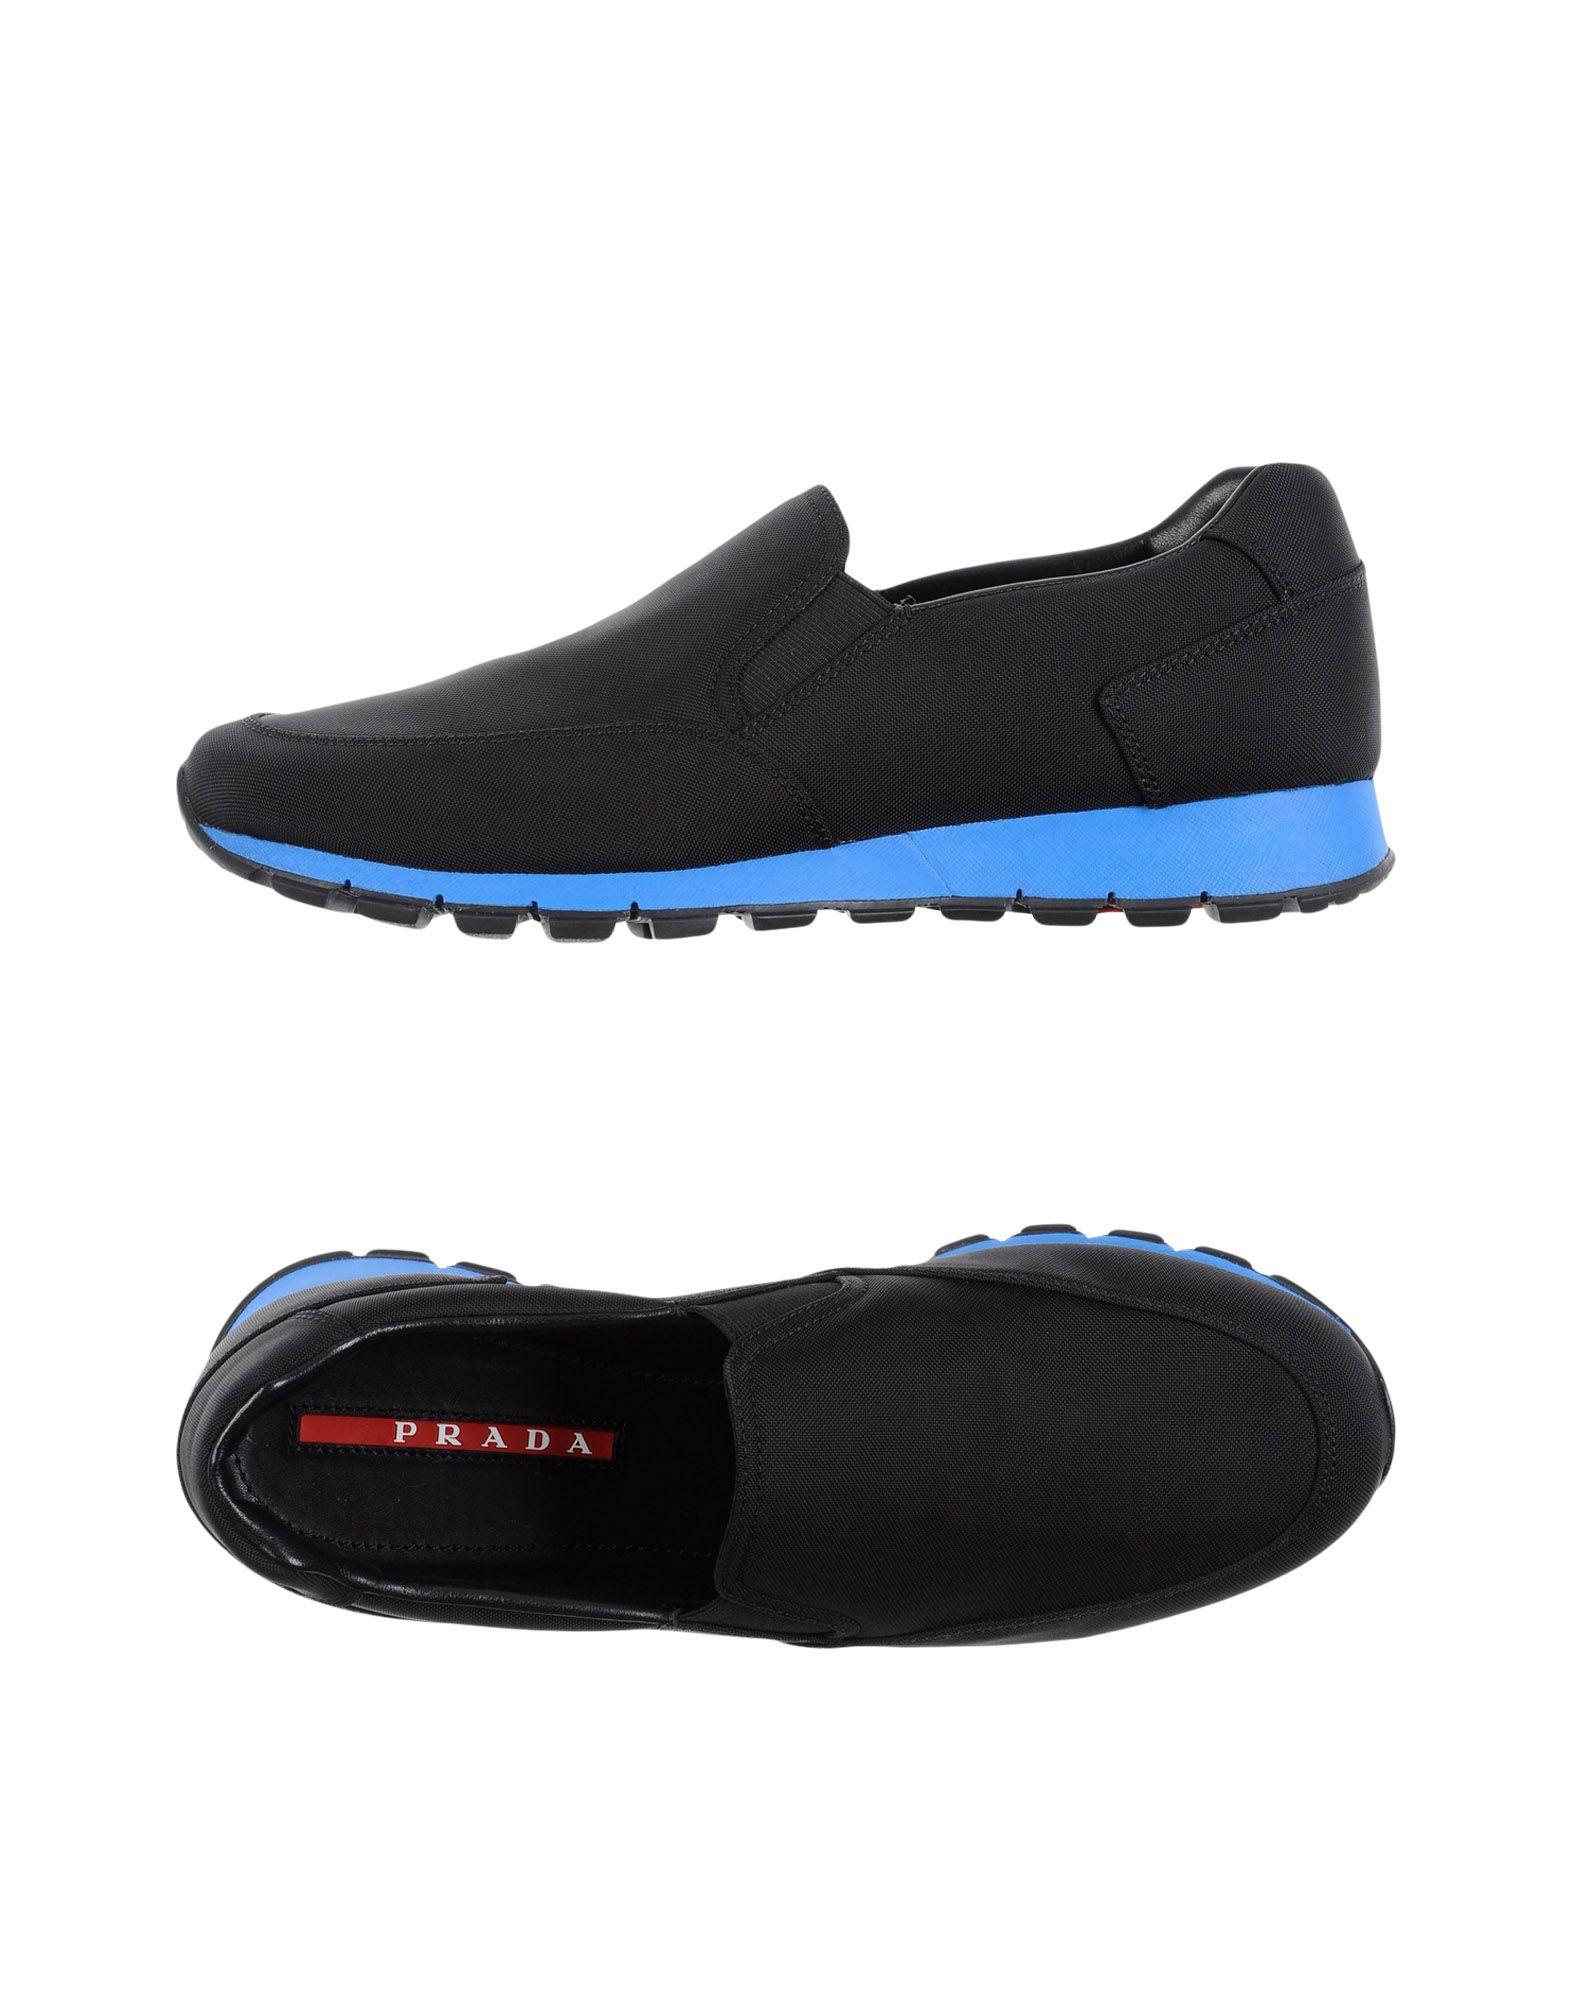 Prada Sport Sneakers Herren  11156128GX Gute Qualität beliebte Schuhe